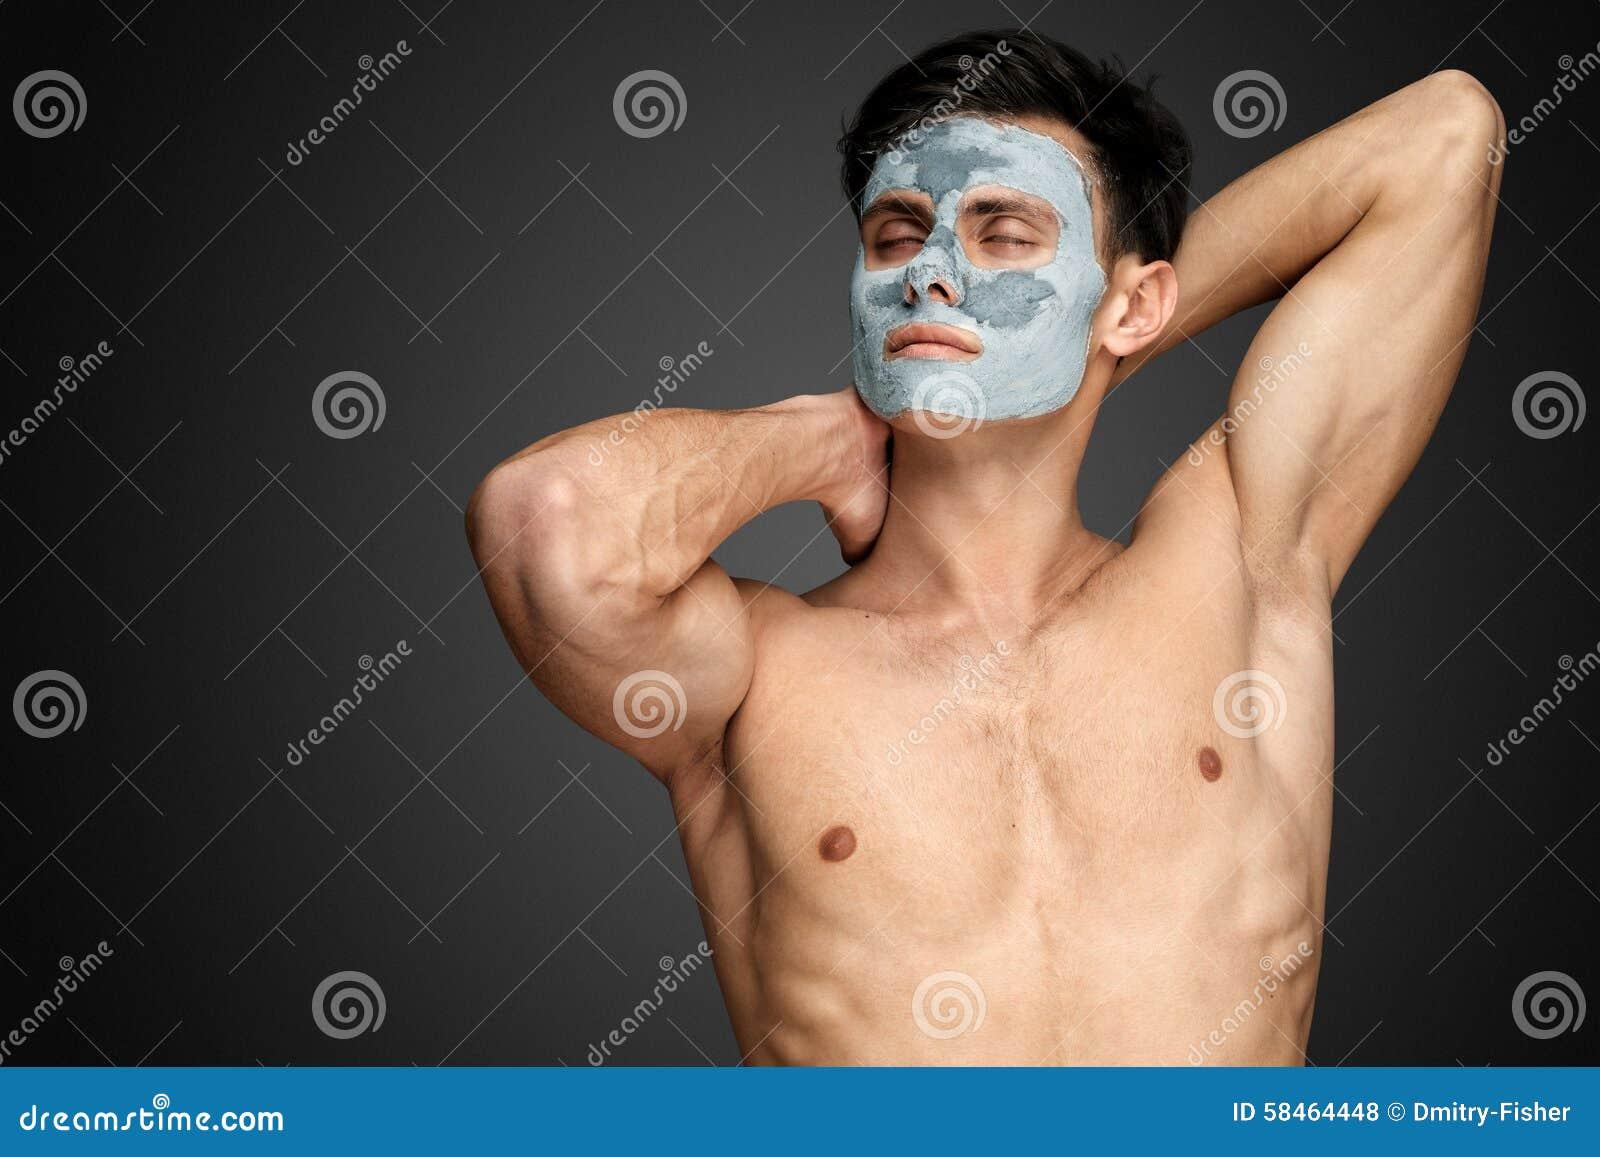 Communication on this topic: DIY Facials: 8 Sheet Face Masks to , diy-facials-8-sheet-face-masks-to/